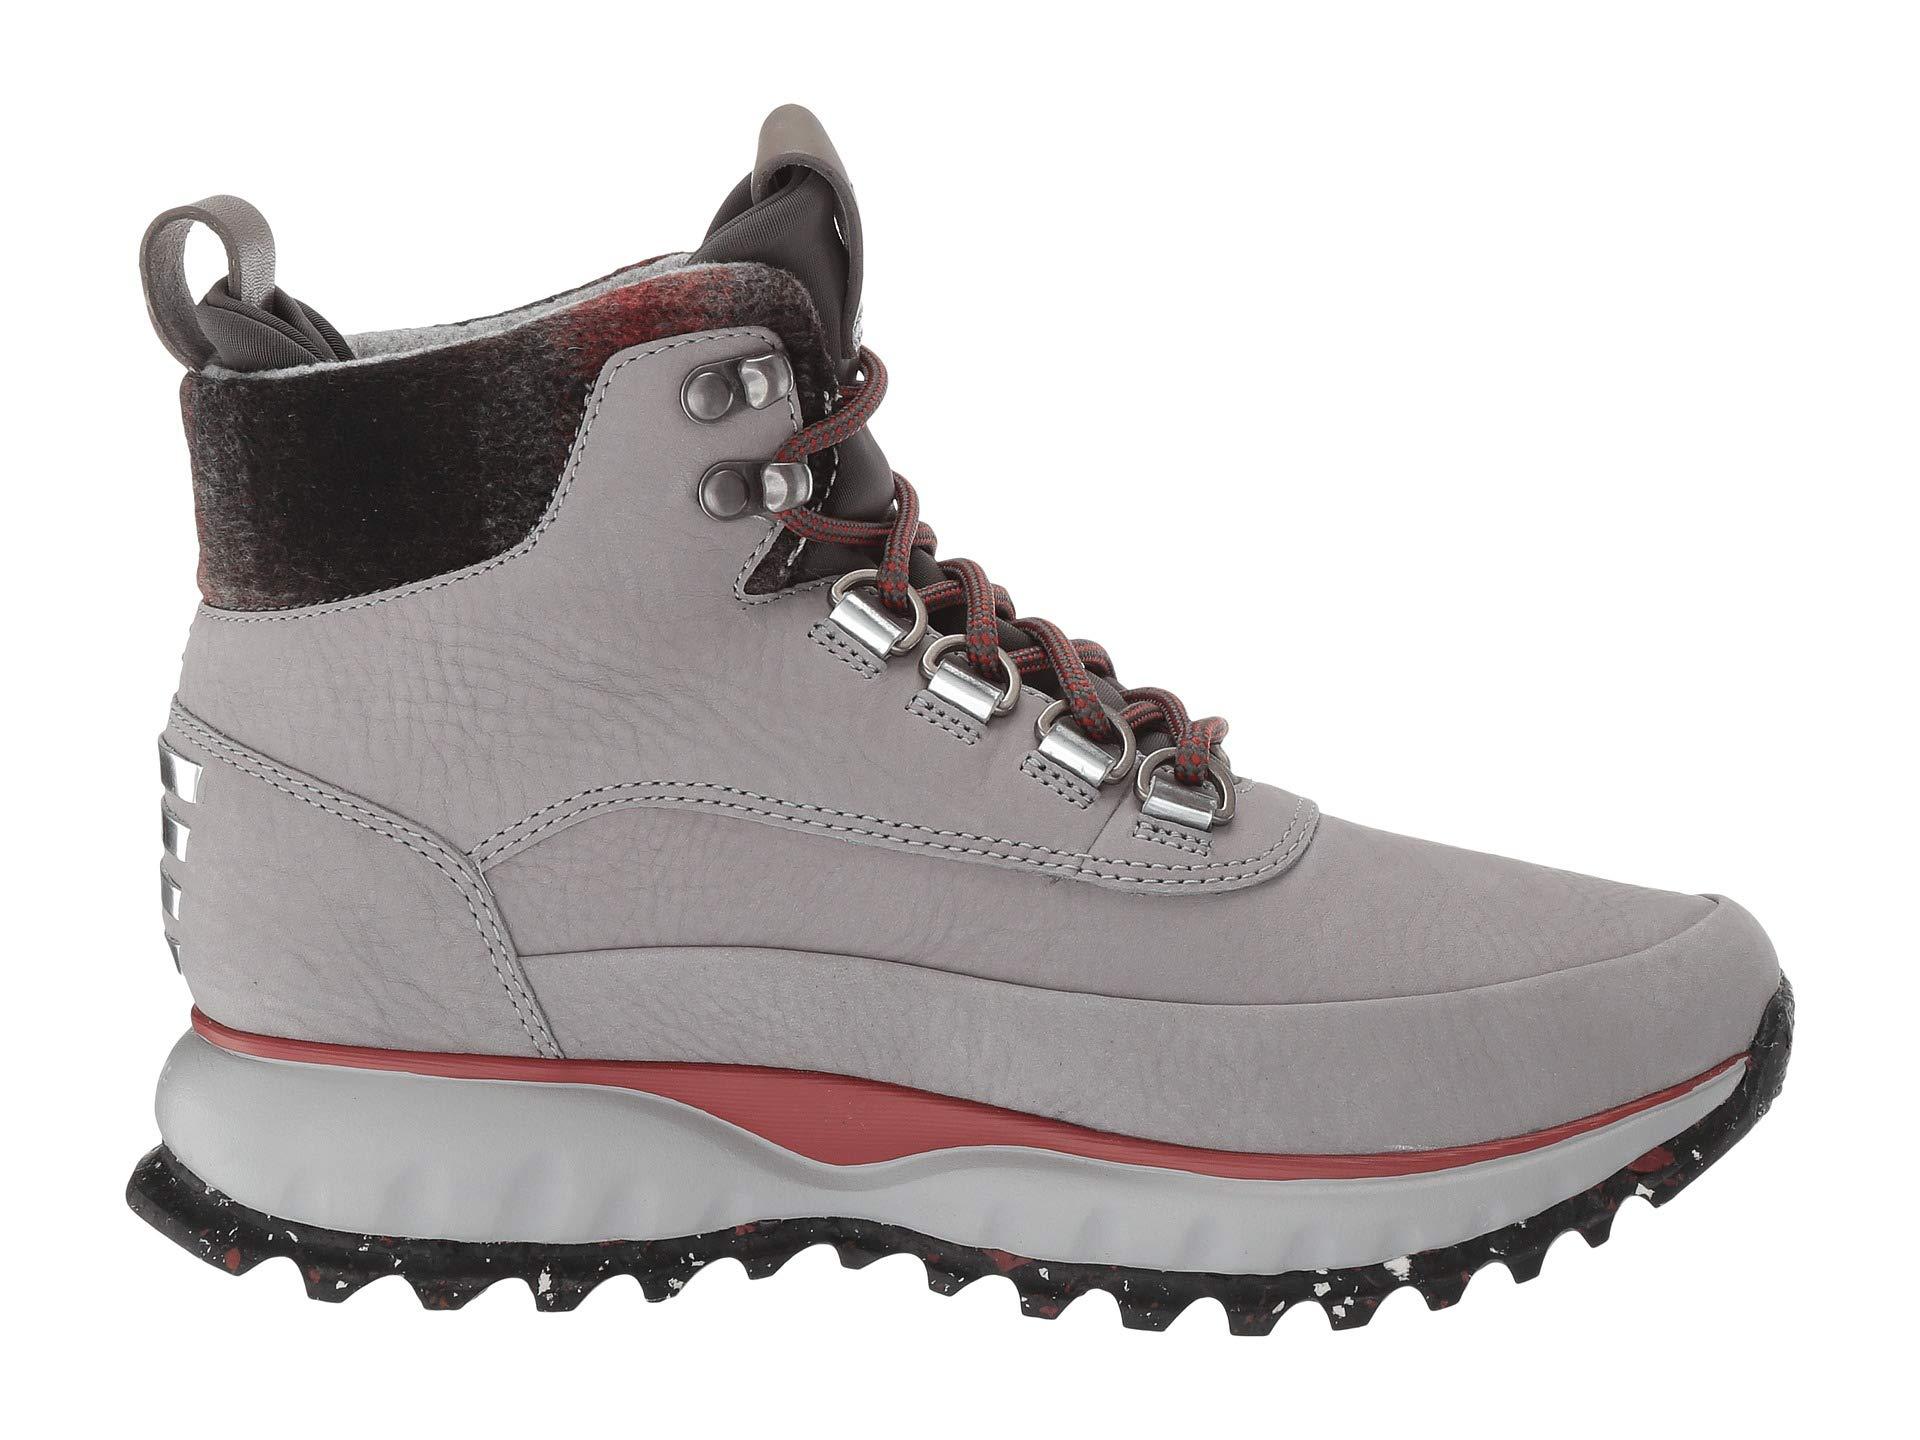 Ochre plaid Ironstone Haan All Wool magnet Nubuck Zerogrand Cole Explore terrain Neoprene Hiker Waterproof Waterproof red 0wZvqq